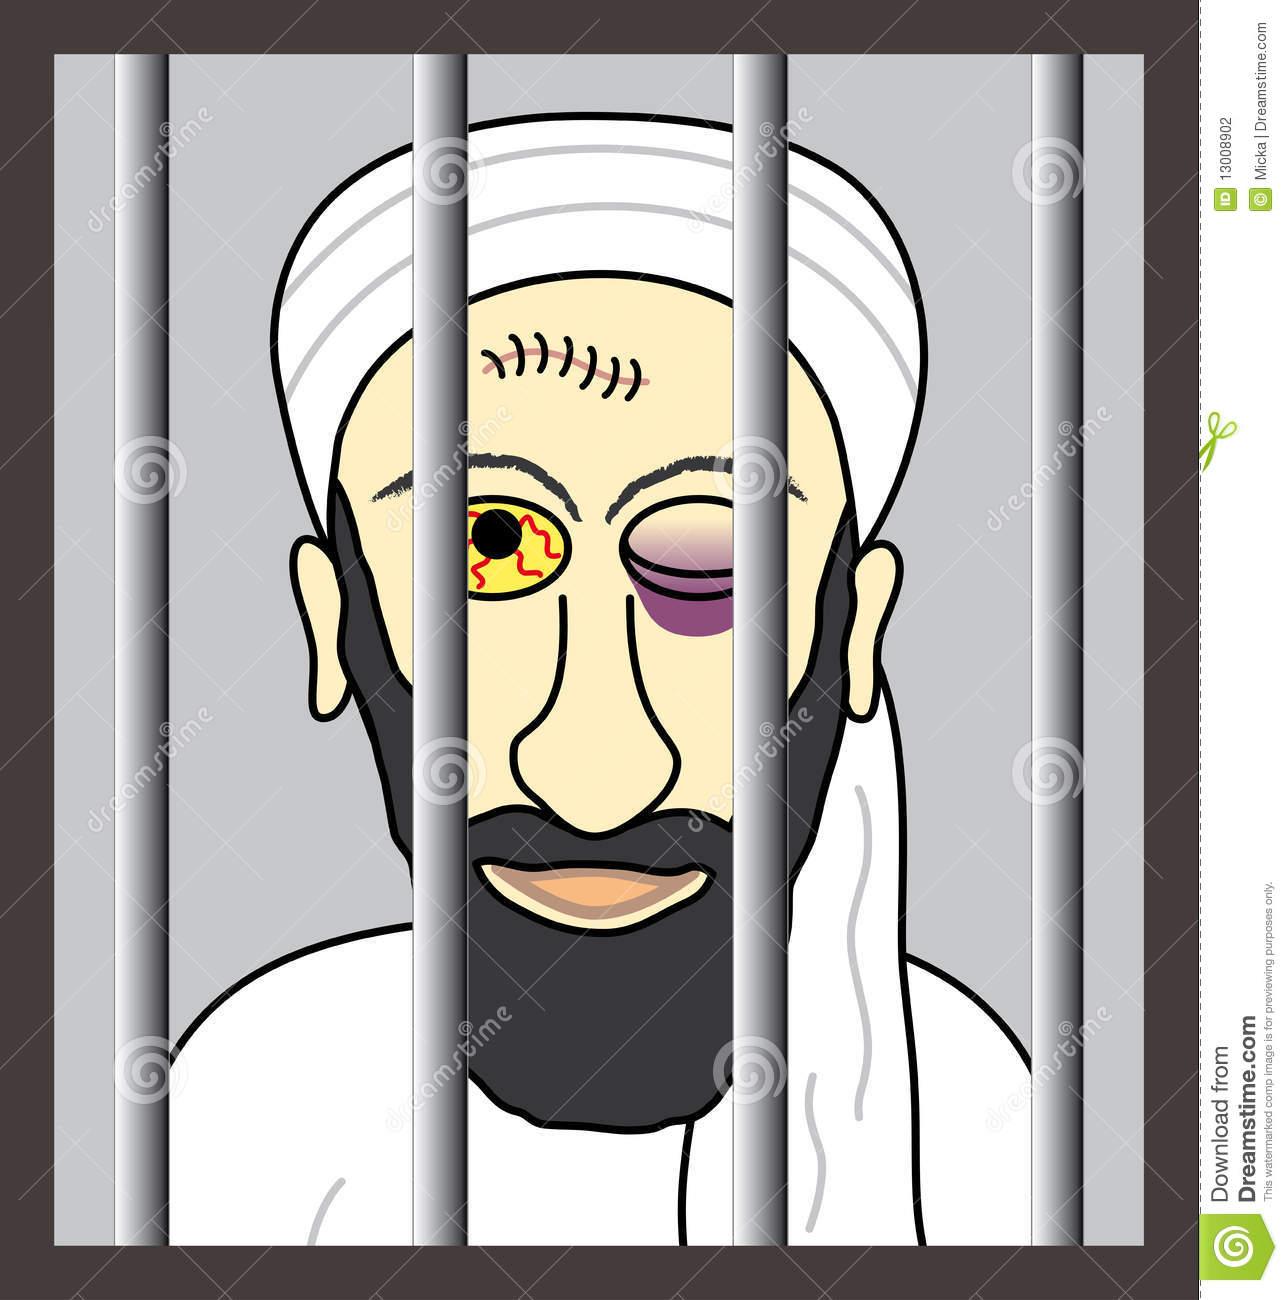 Cartoon Osama Bin Laden Royalty Free Stock Photo.